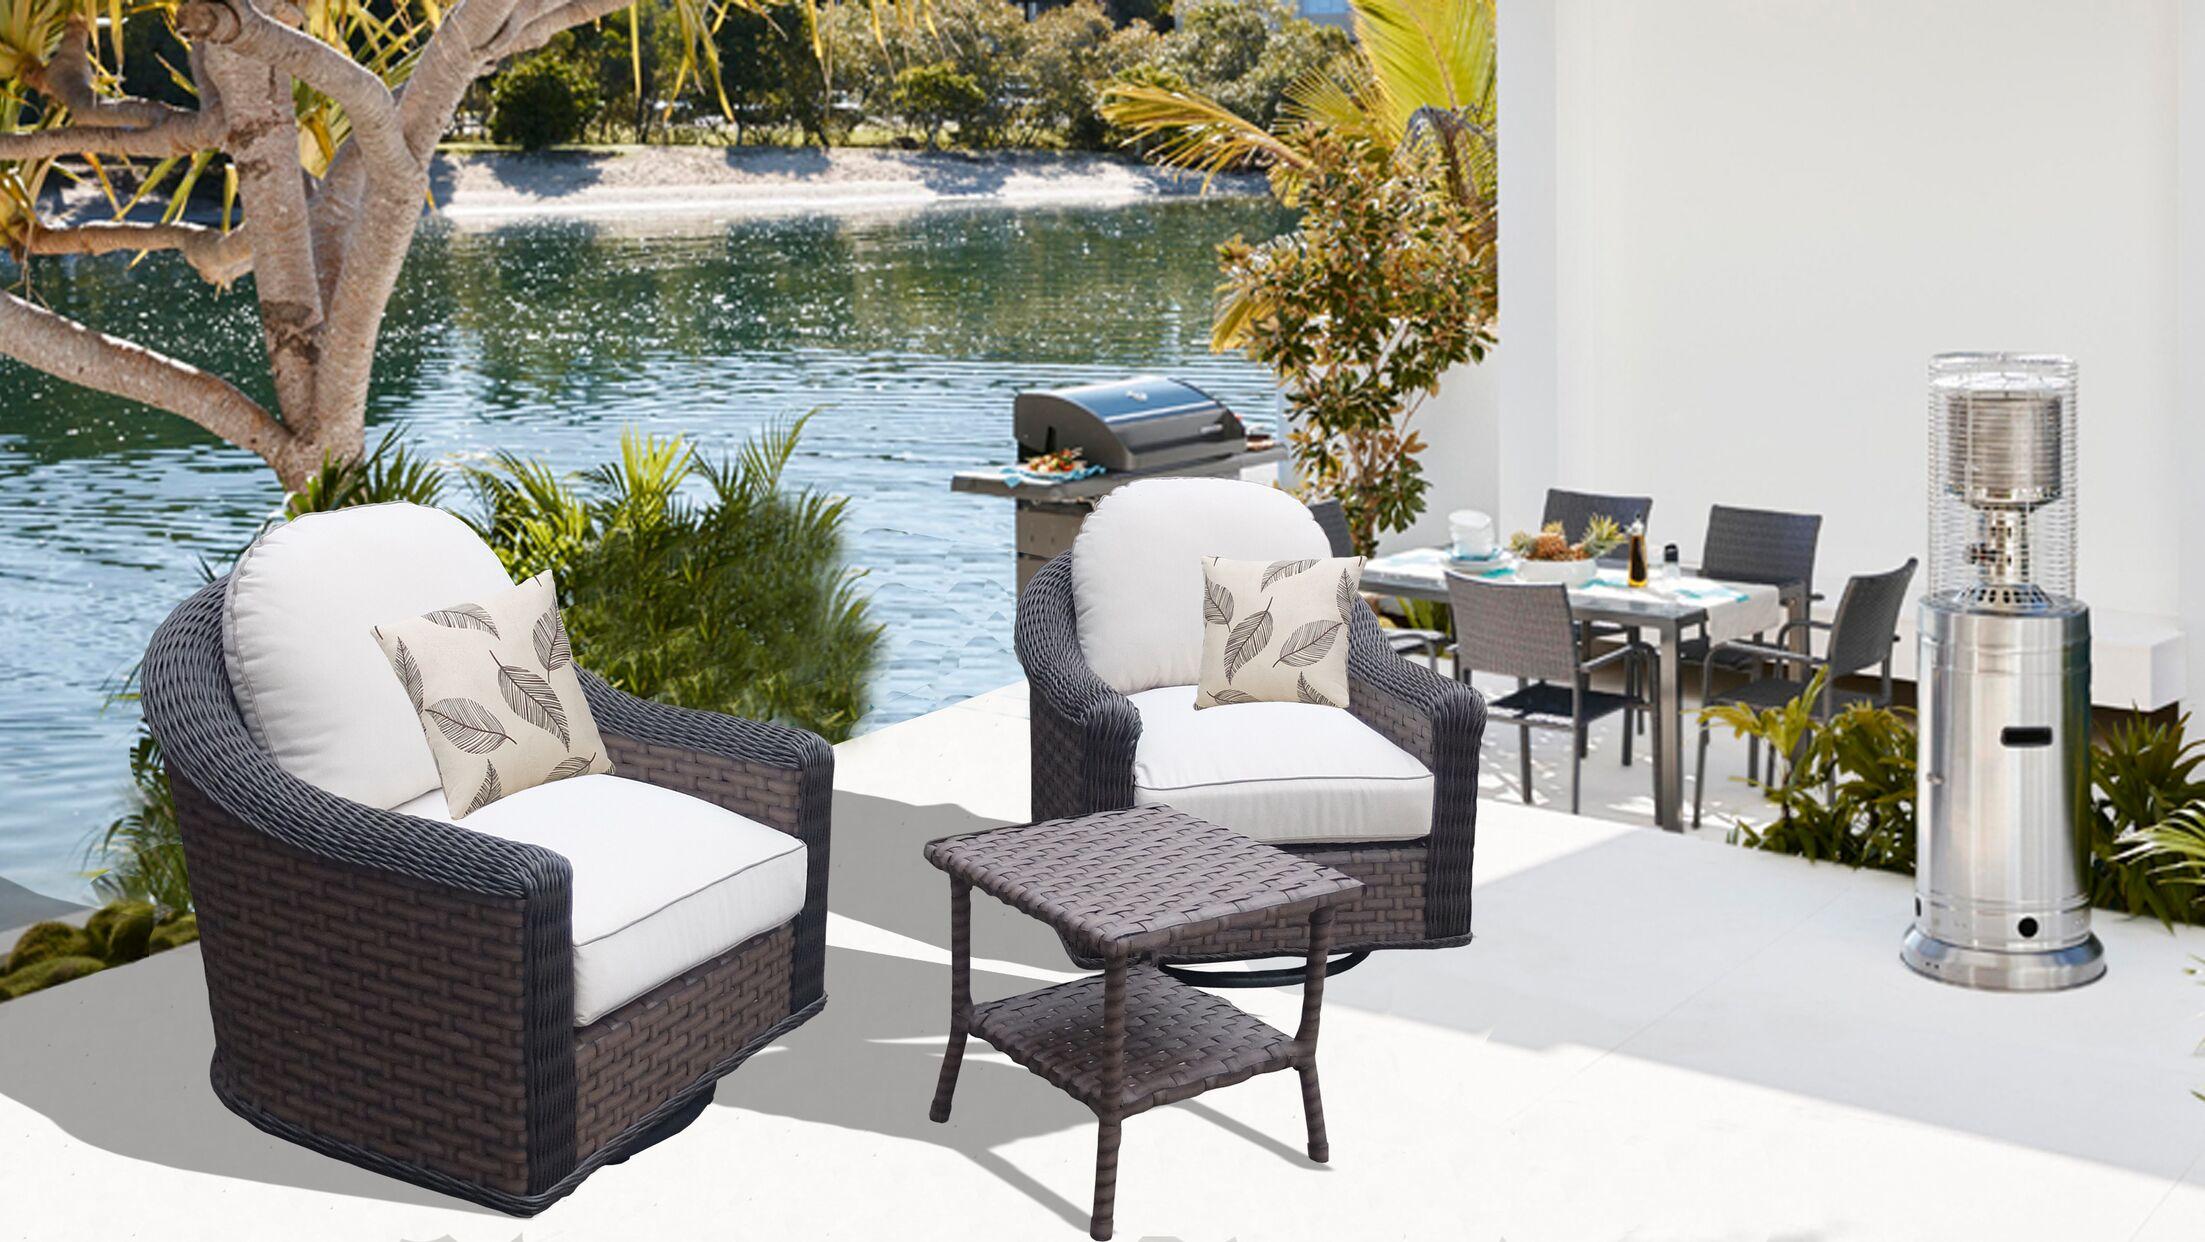 Gaia 3 Piece Conversation Set with Cushions